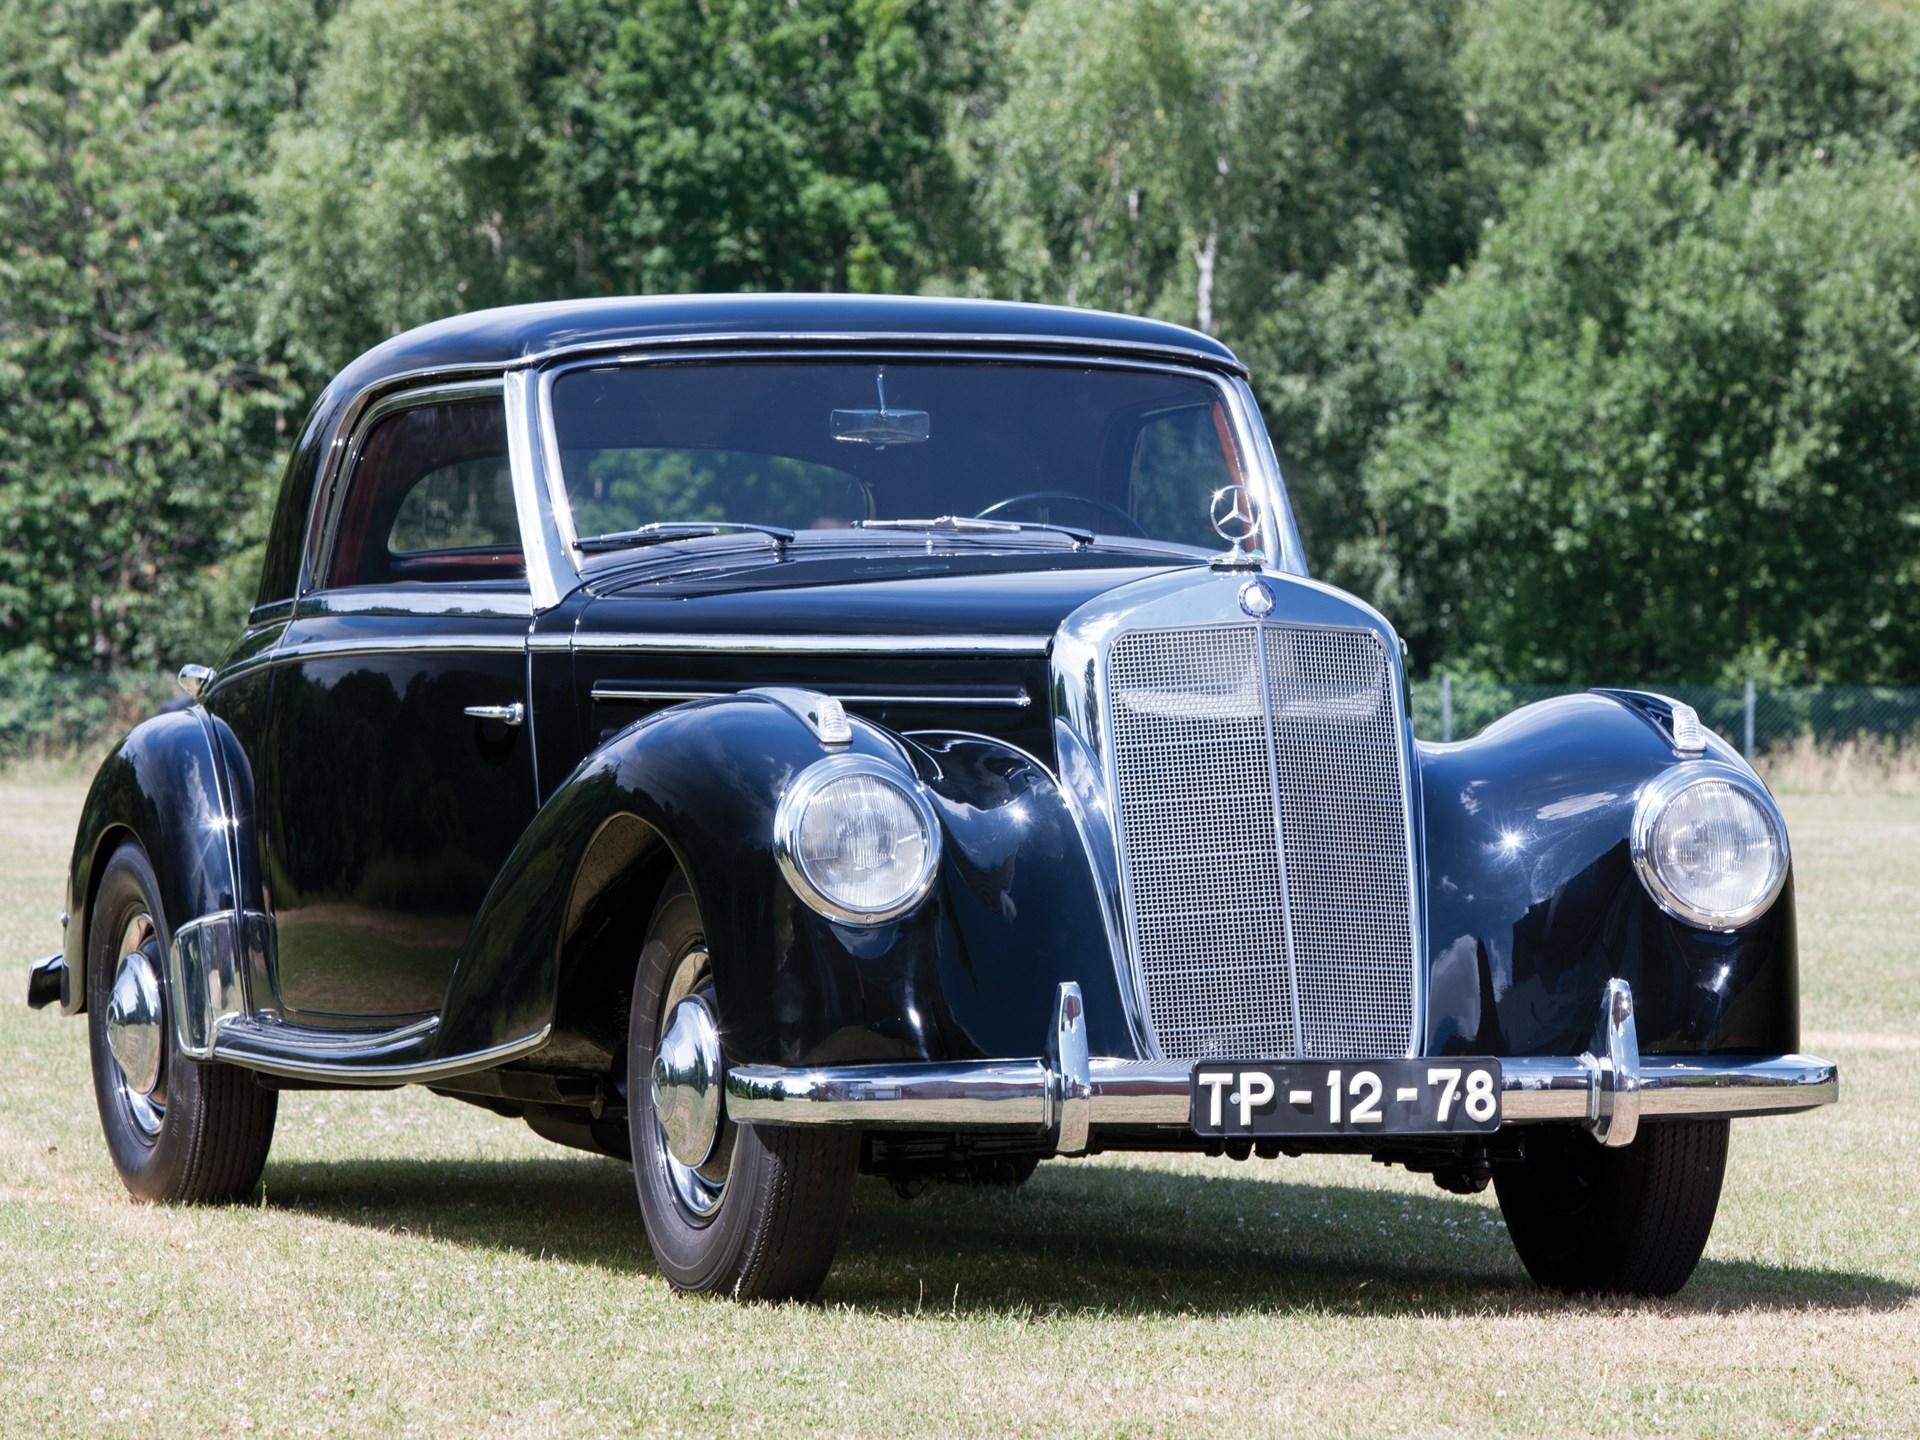 RM Sotheby's - 1951 Mercedes-Benz 220 Coupé Prototype ...